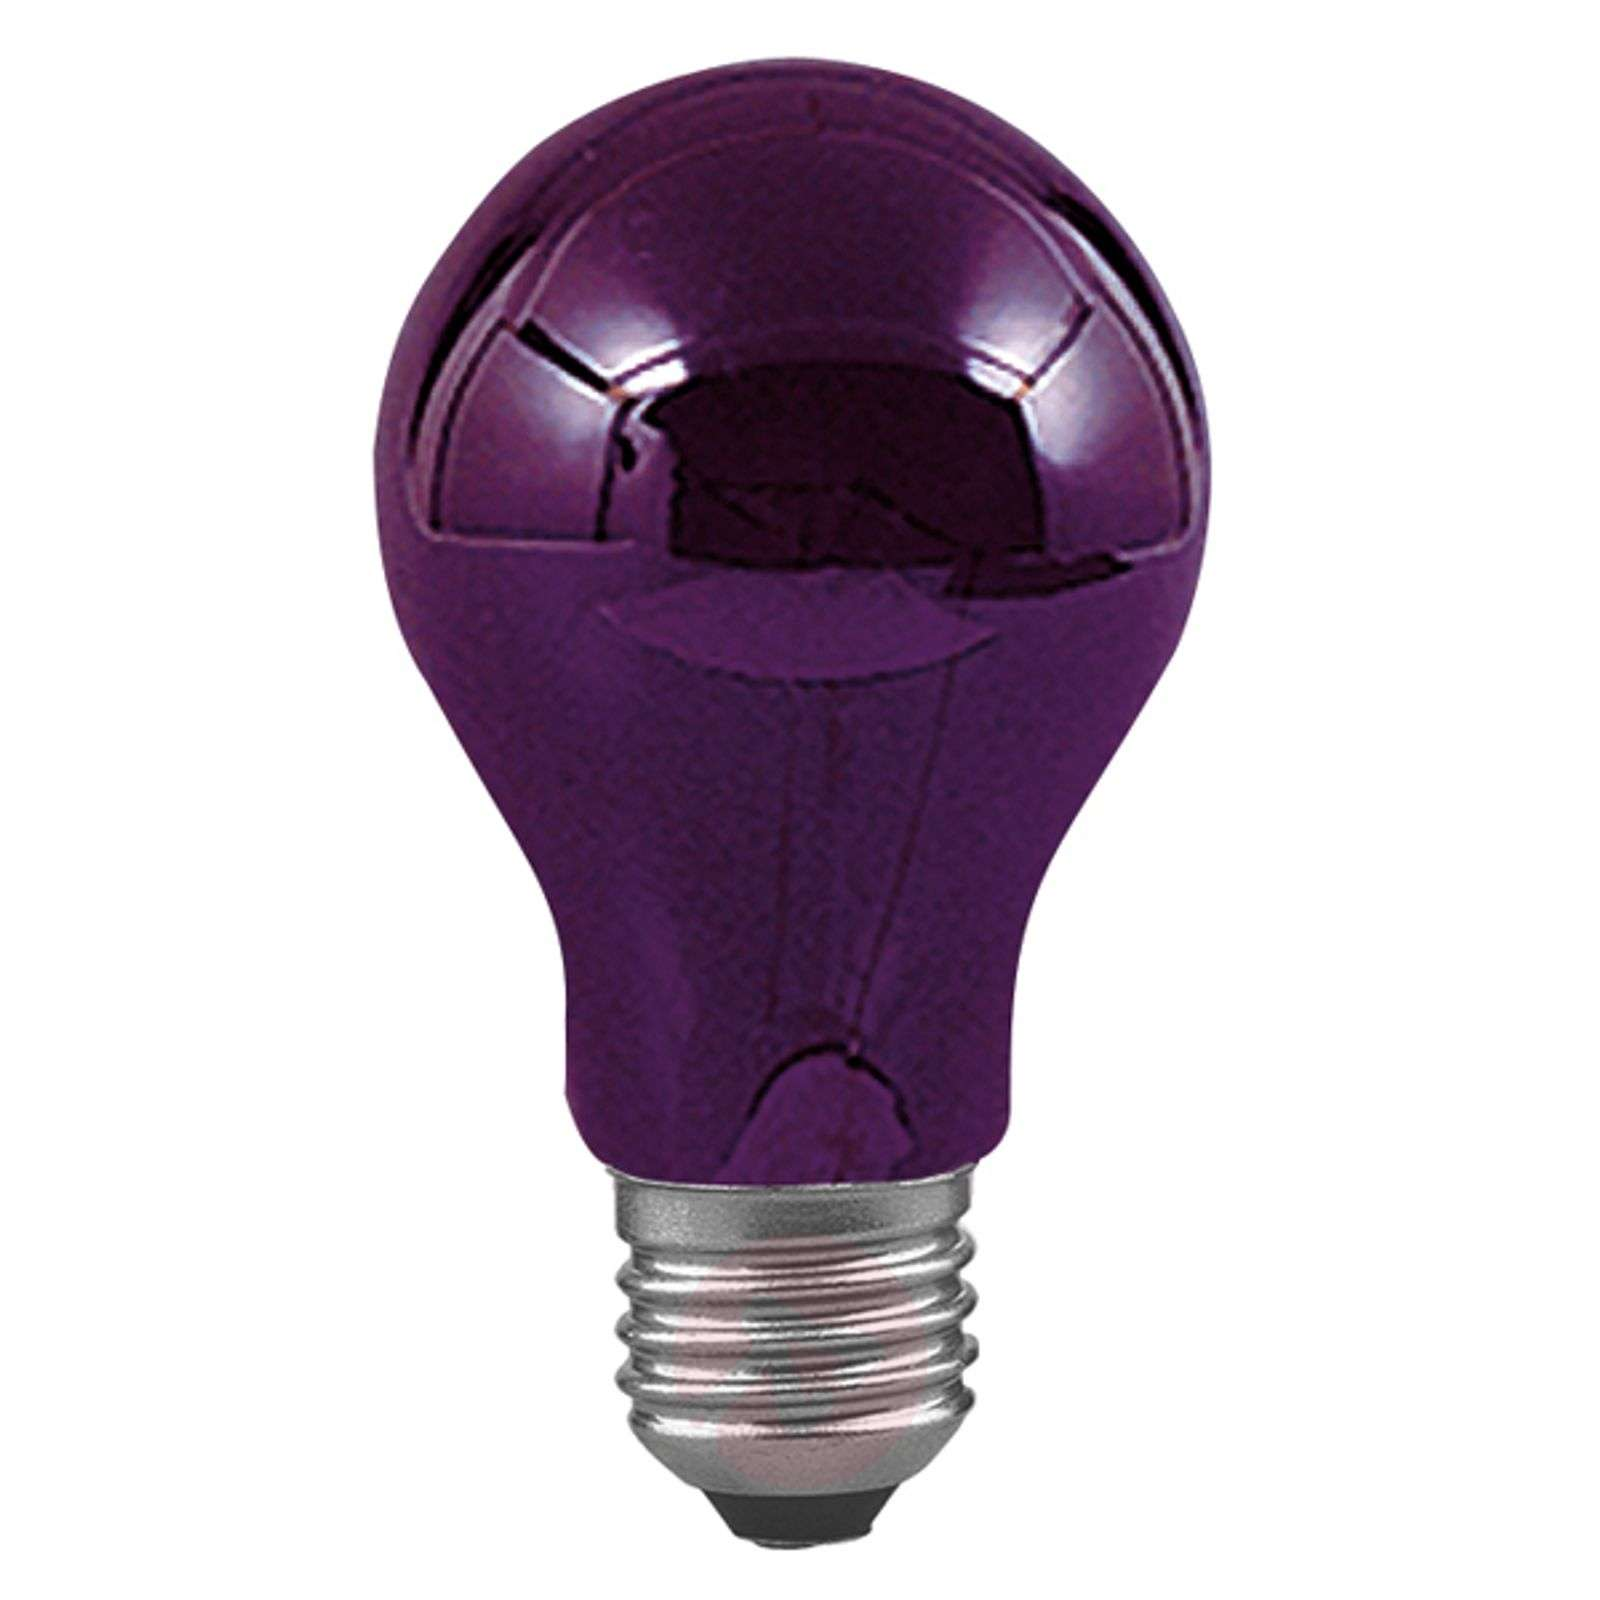 E27 75 W black light bulb, dimmable-7601022-01